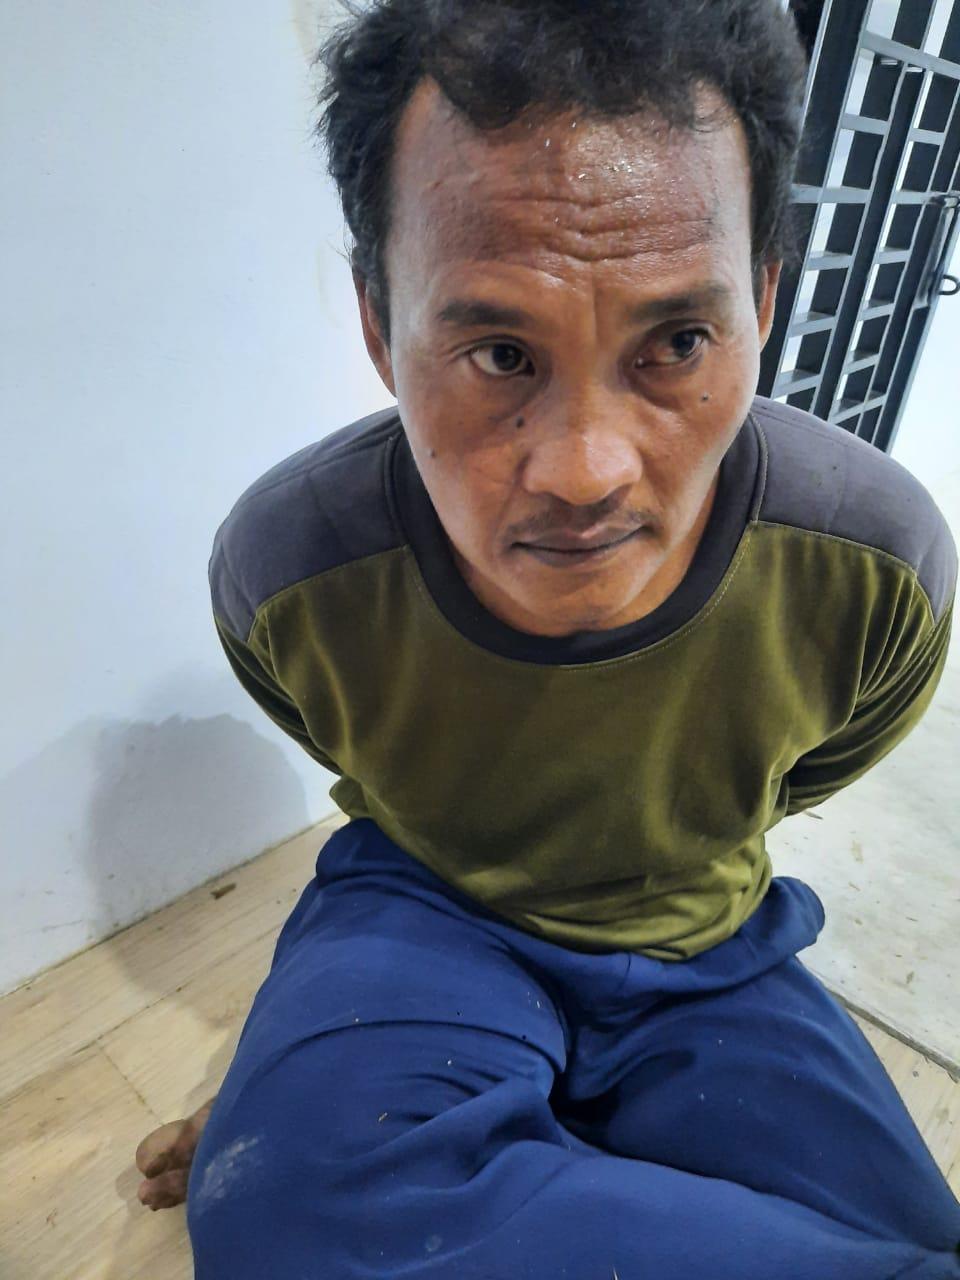 Aniaya Istri ,Seorang Suami ditangkap Polisi